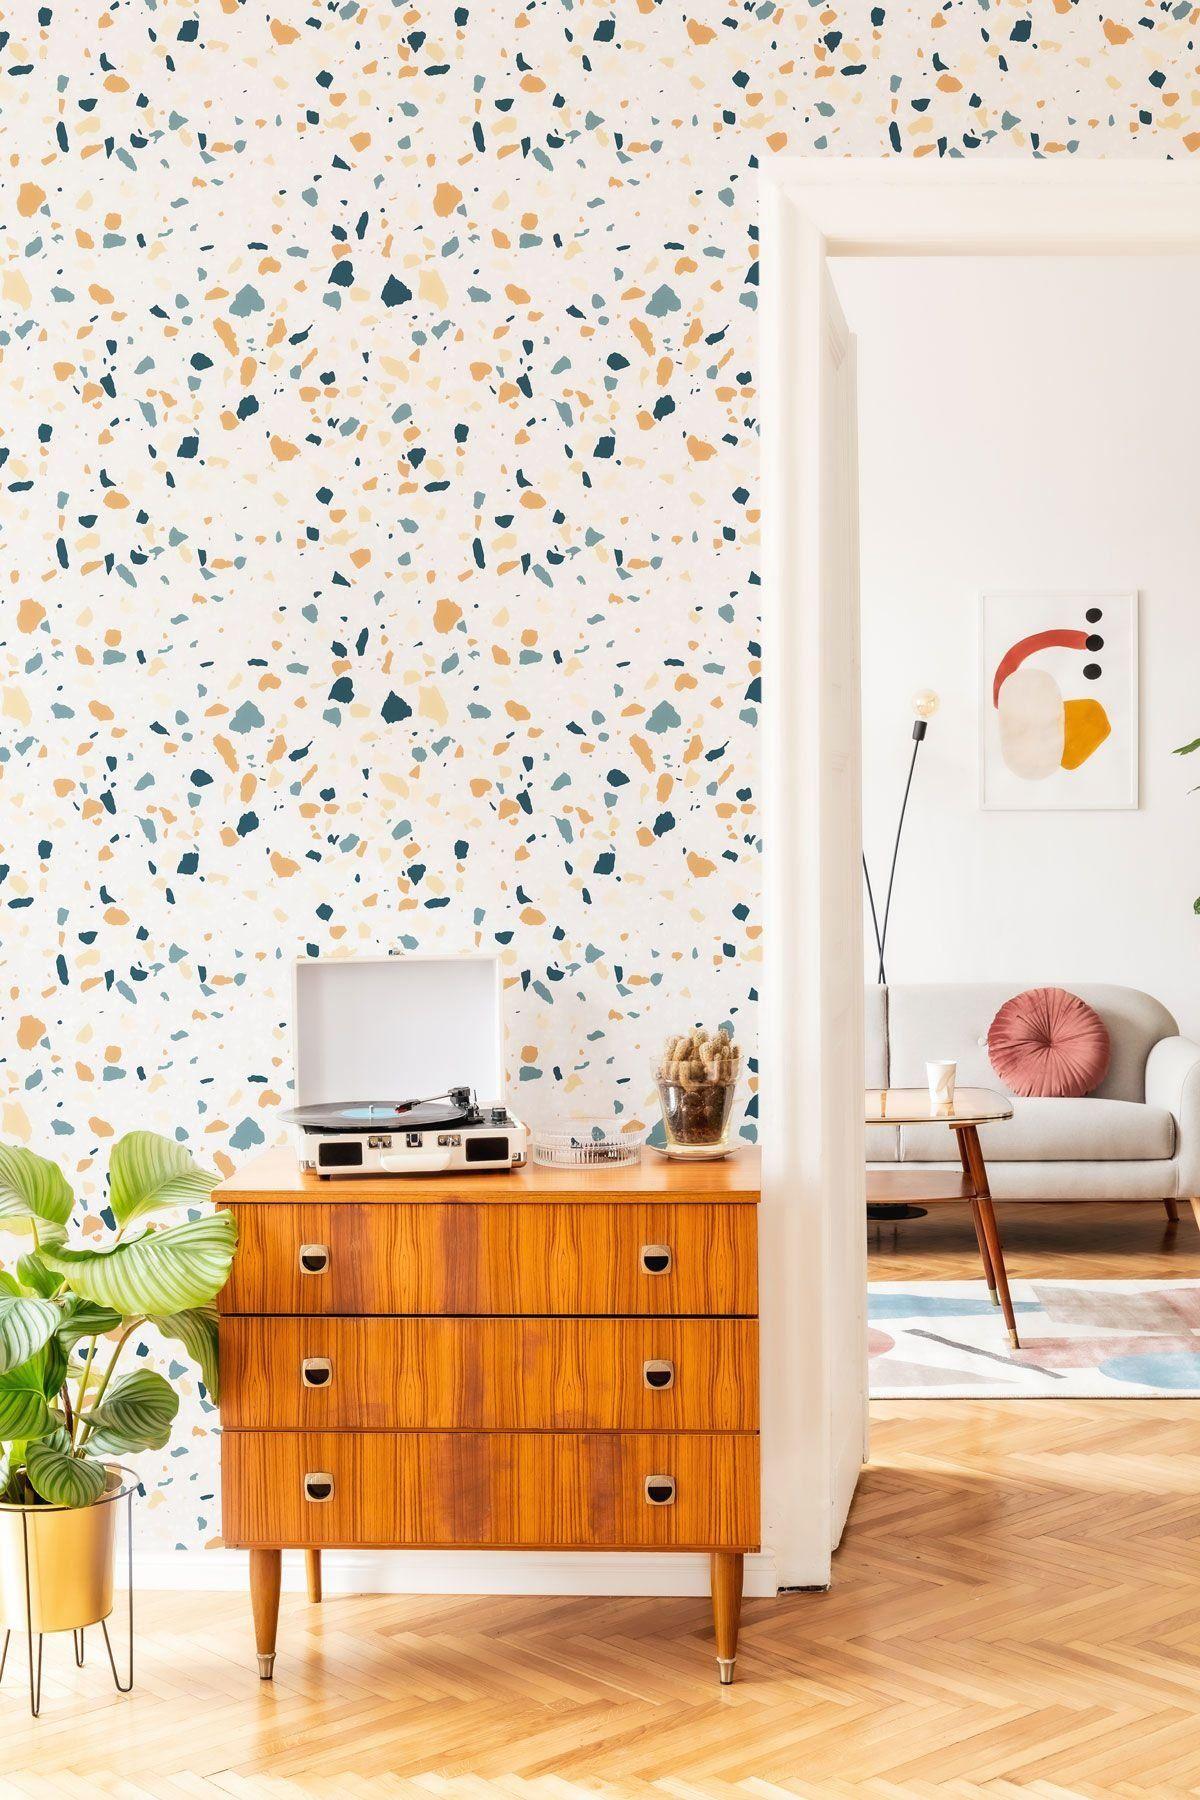 Modern Leaf Peel And Stick Wallpaper Removable Etsy In 2021 Peel And Stick Wallpaper Blue Vinyl Removable Wallpaper